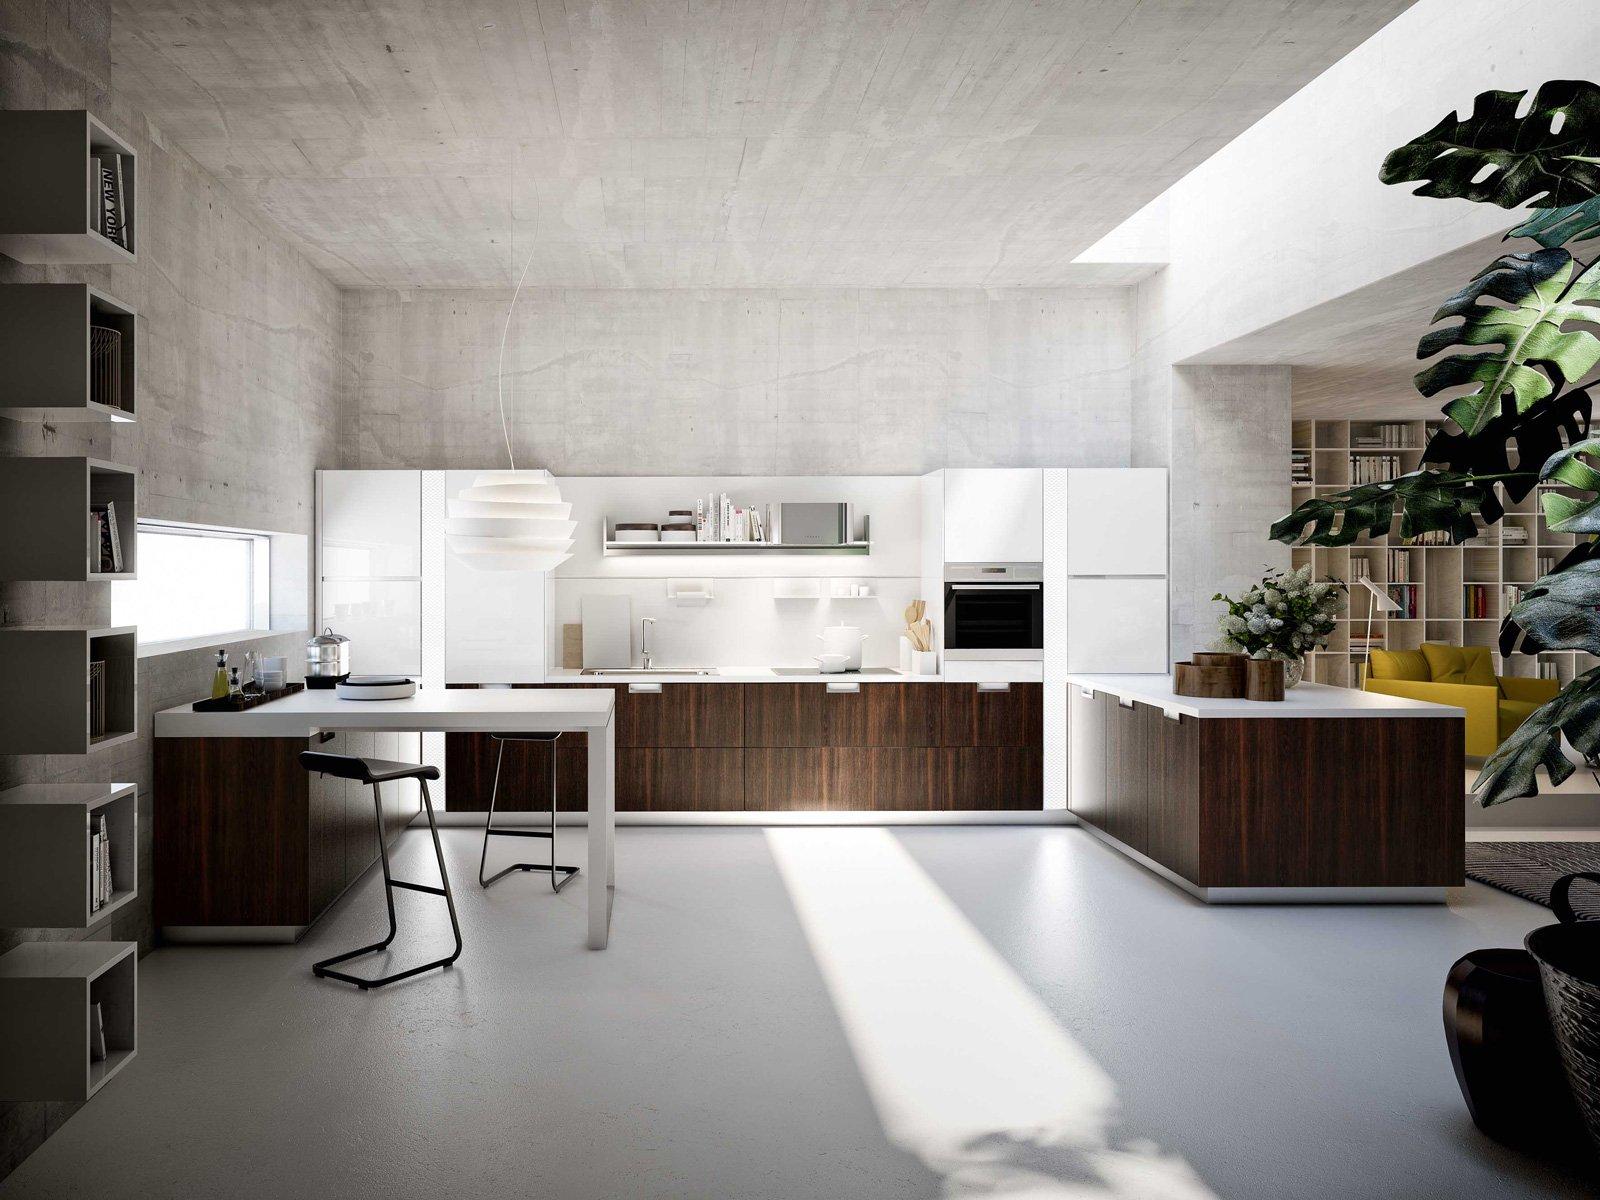 Cucine in legno: tradizionali, country o moderne - Cose di Casa